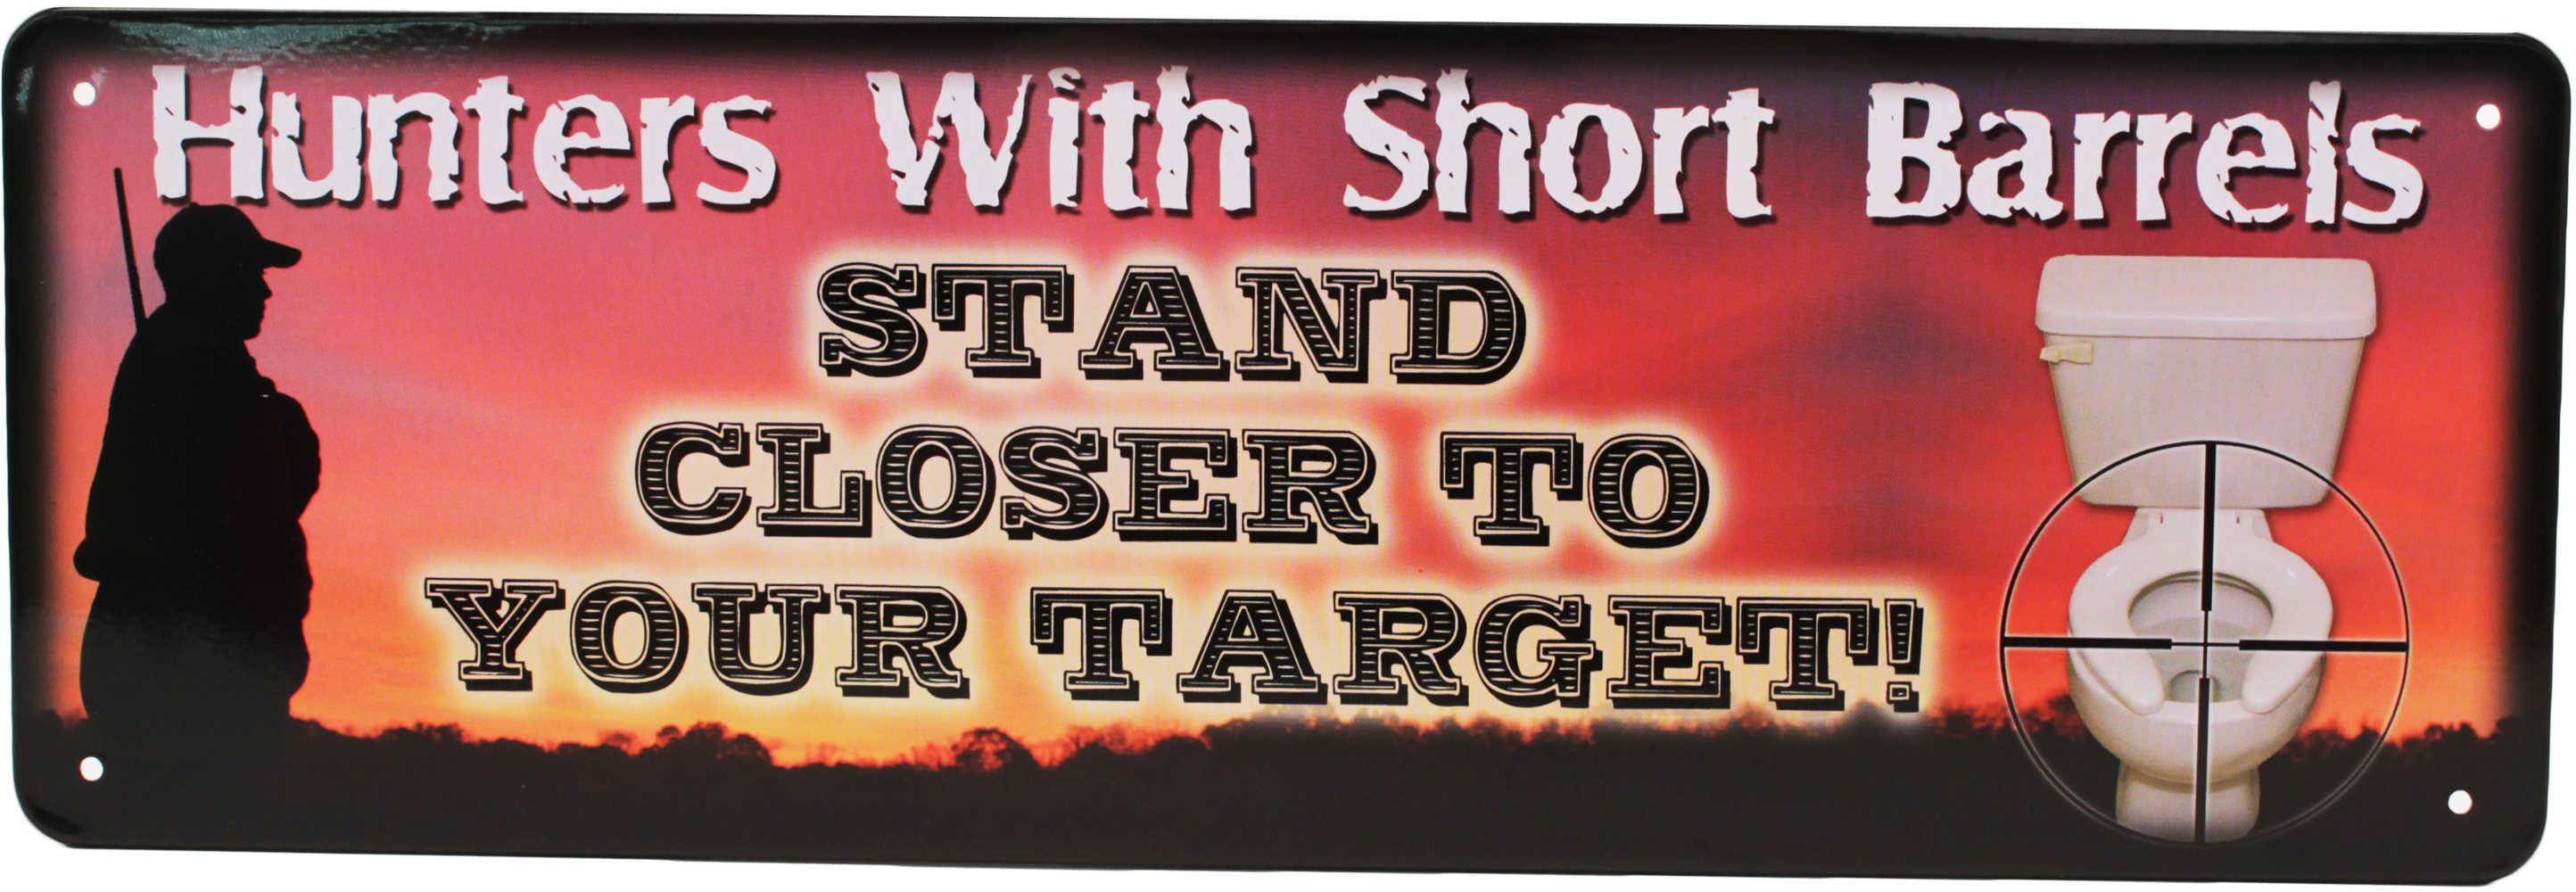 "Rivers Edge Products 10.5"" x 3.5"" Tin Sign Hunters w/Short Barrels 1416"